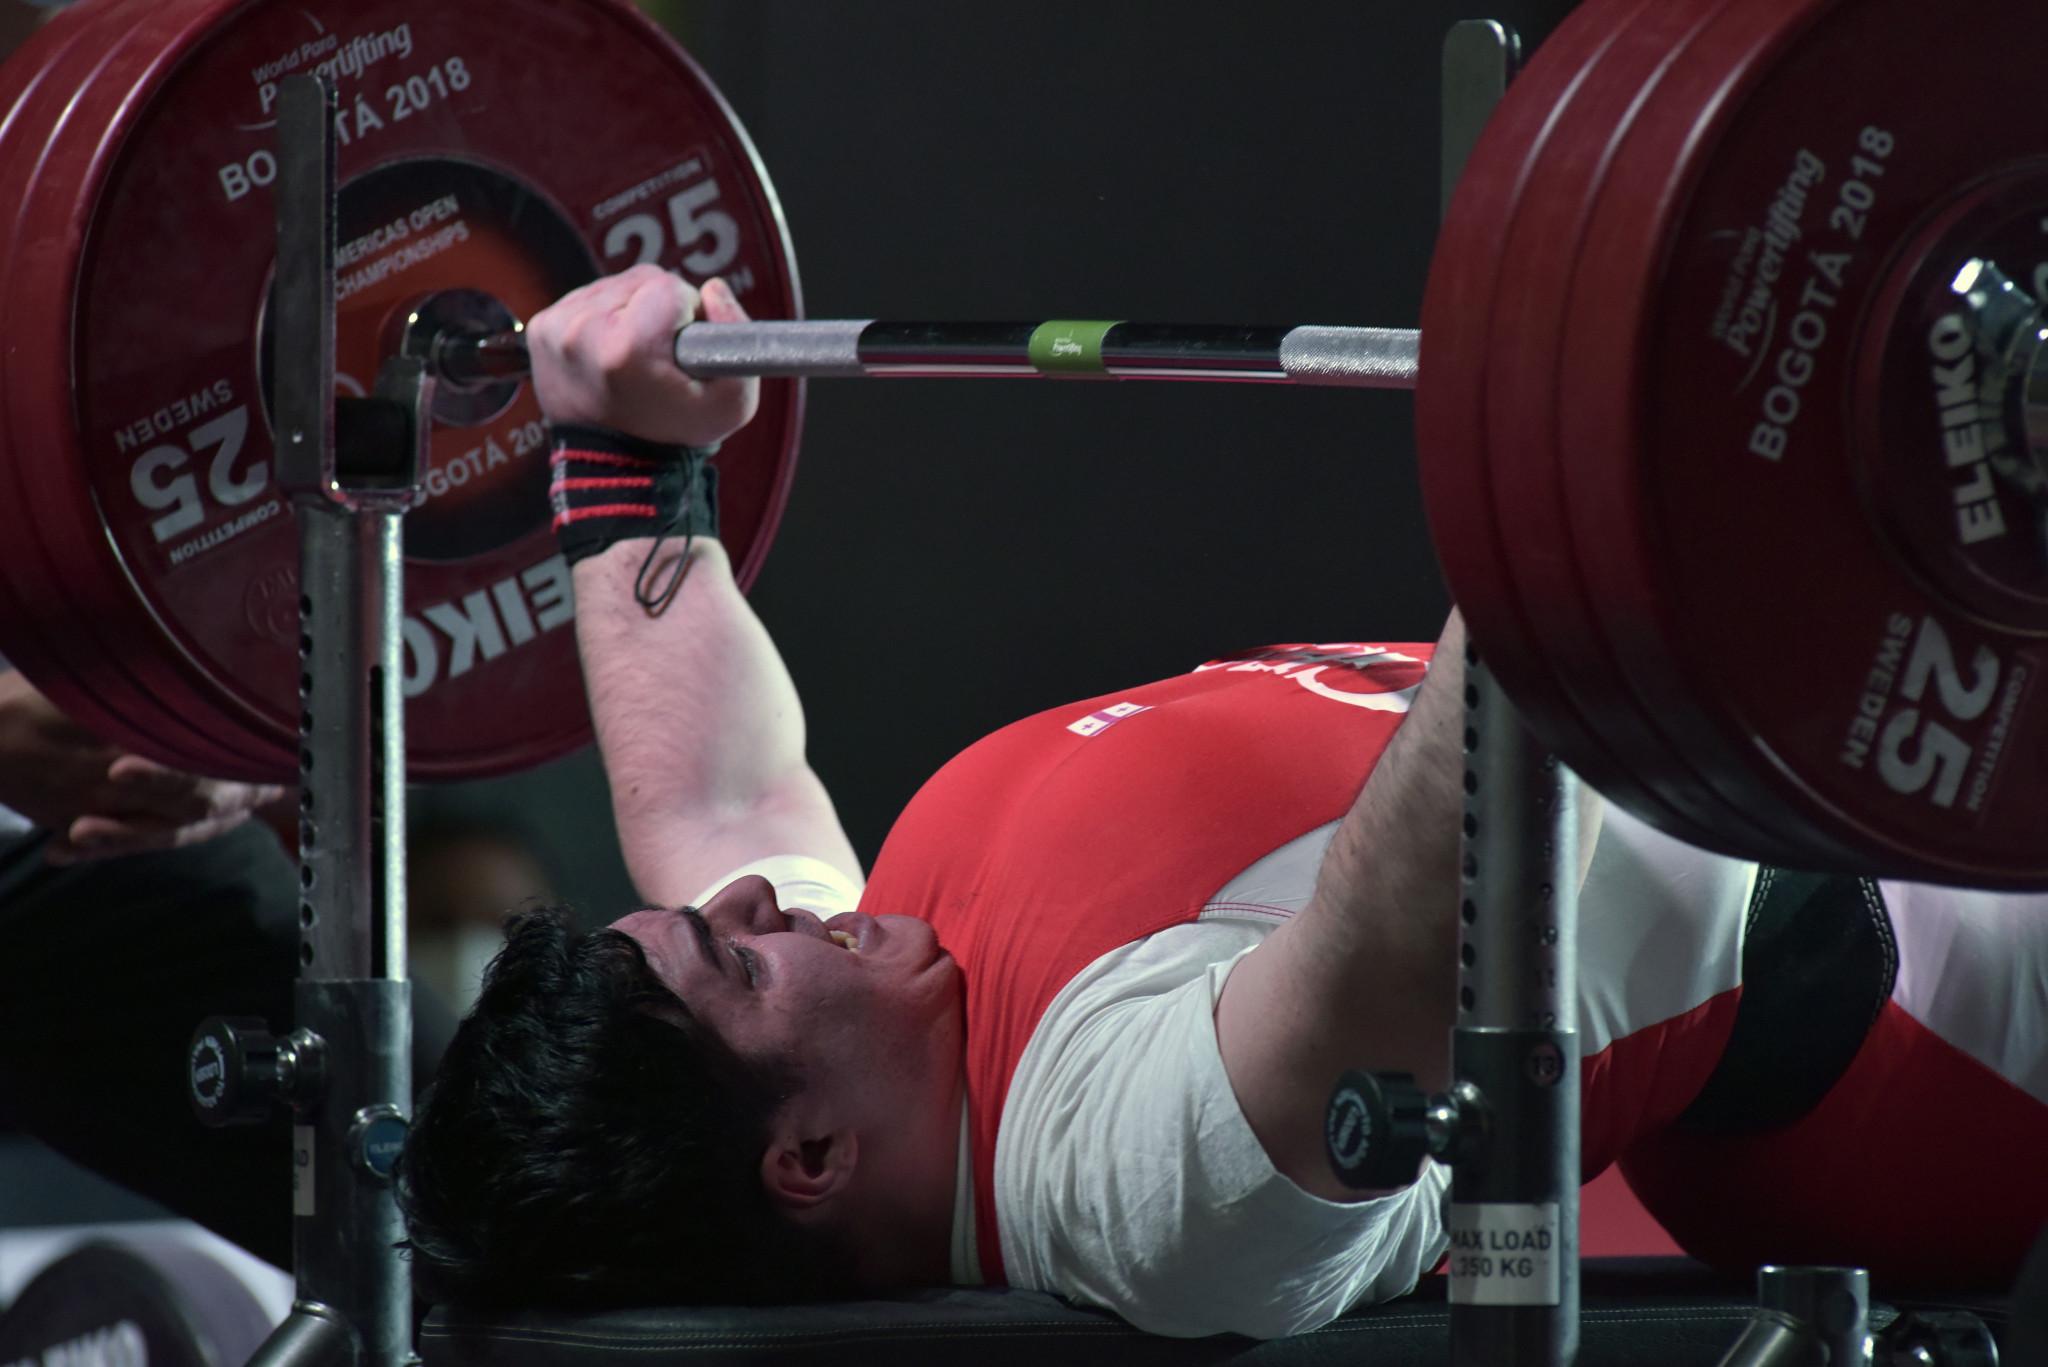 Nigeria, Uzbekistan and Georgia claim gold on penultimate day of World Para Powerlifting World Cup